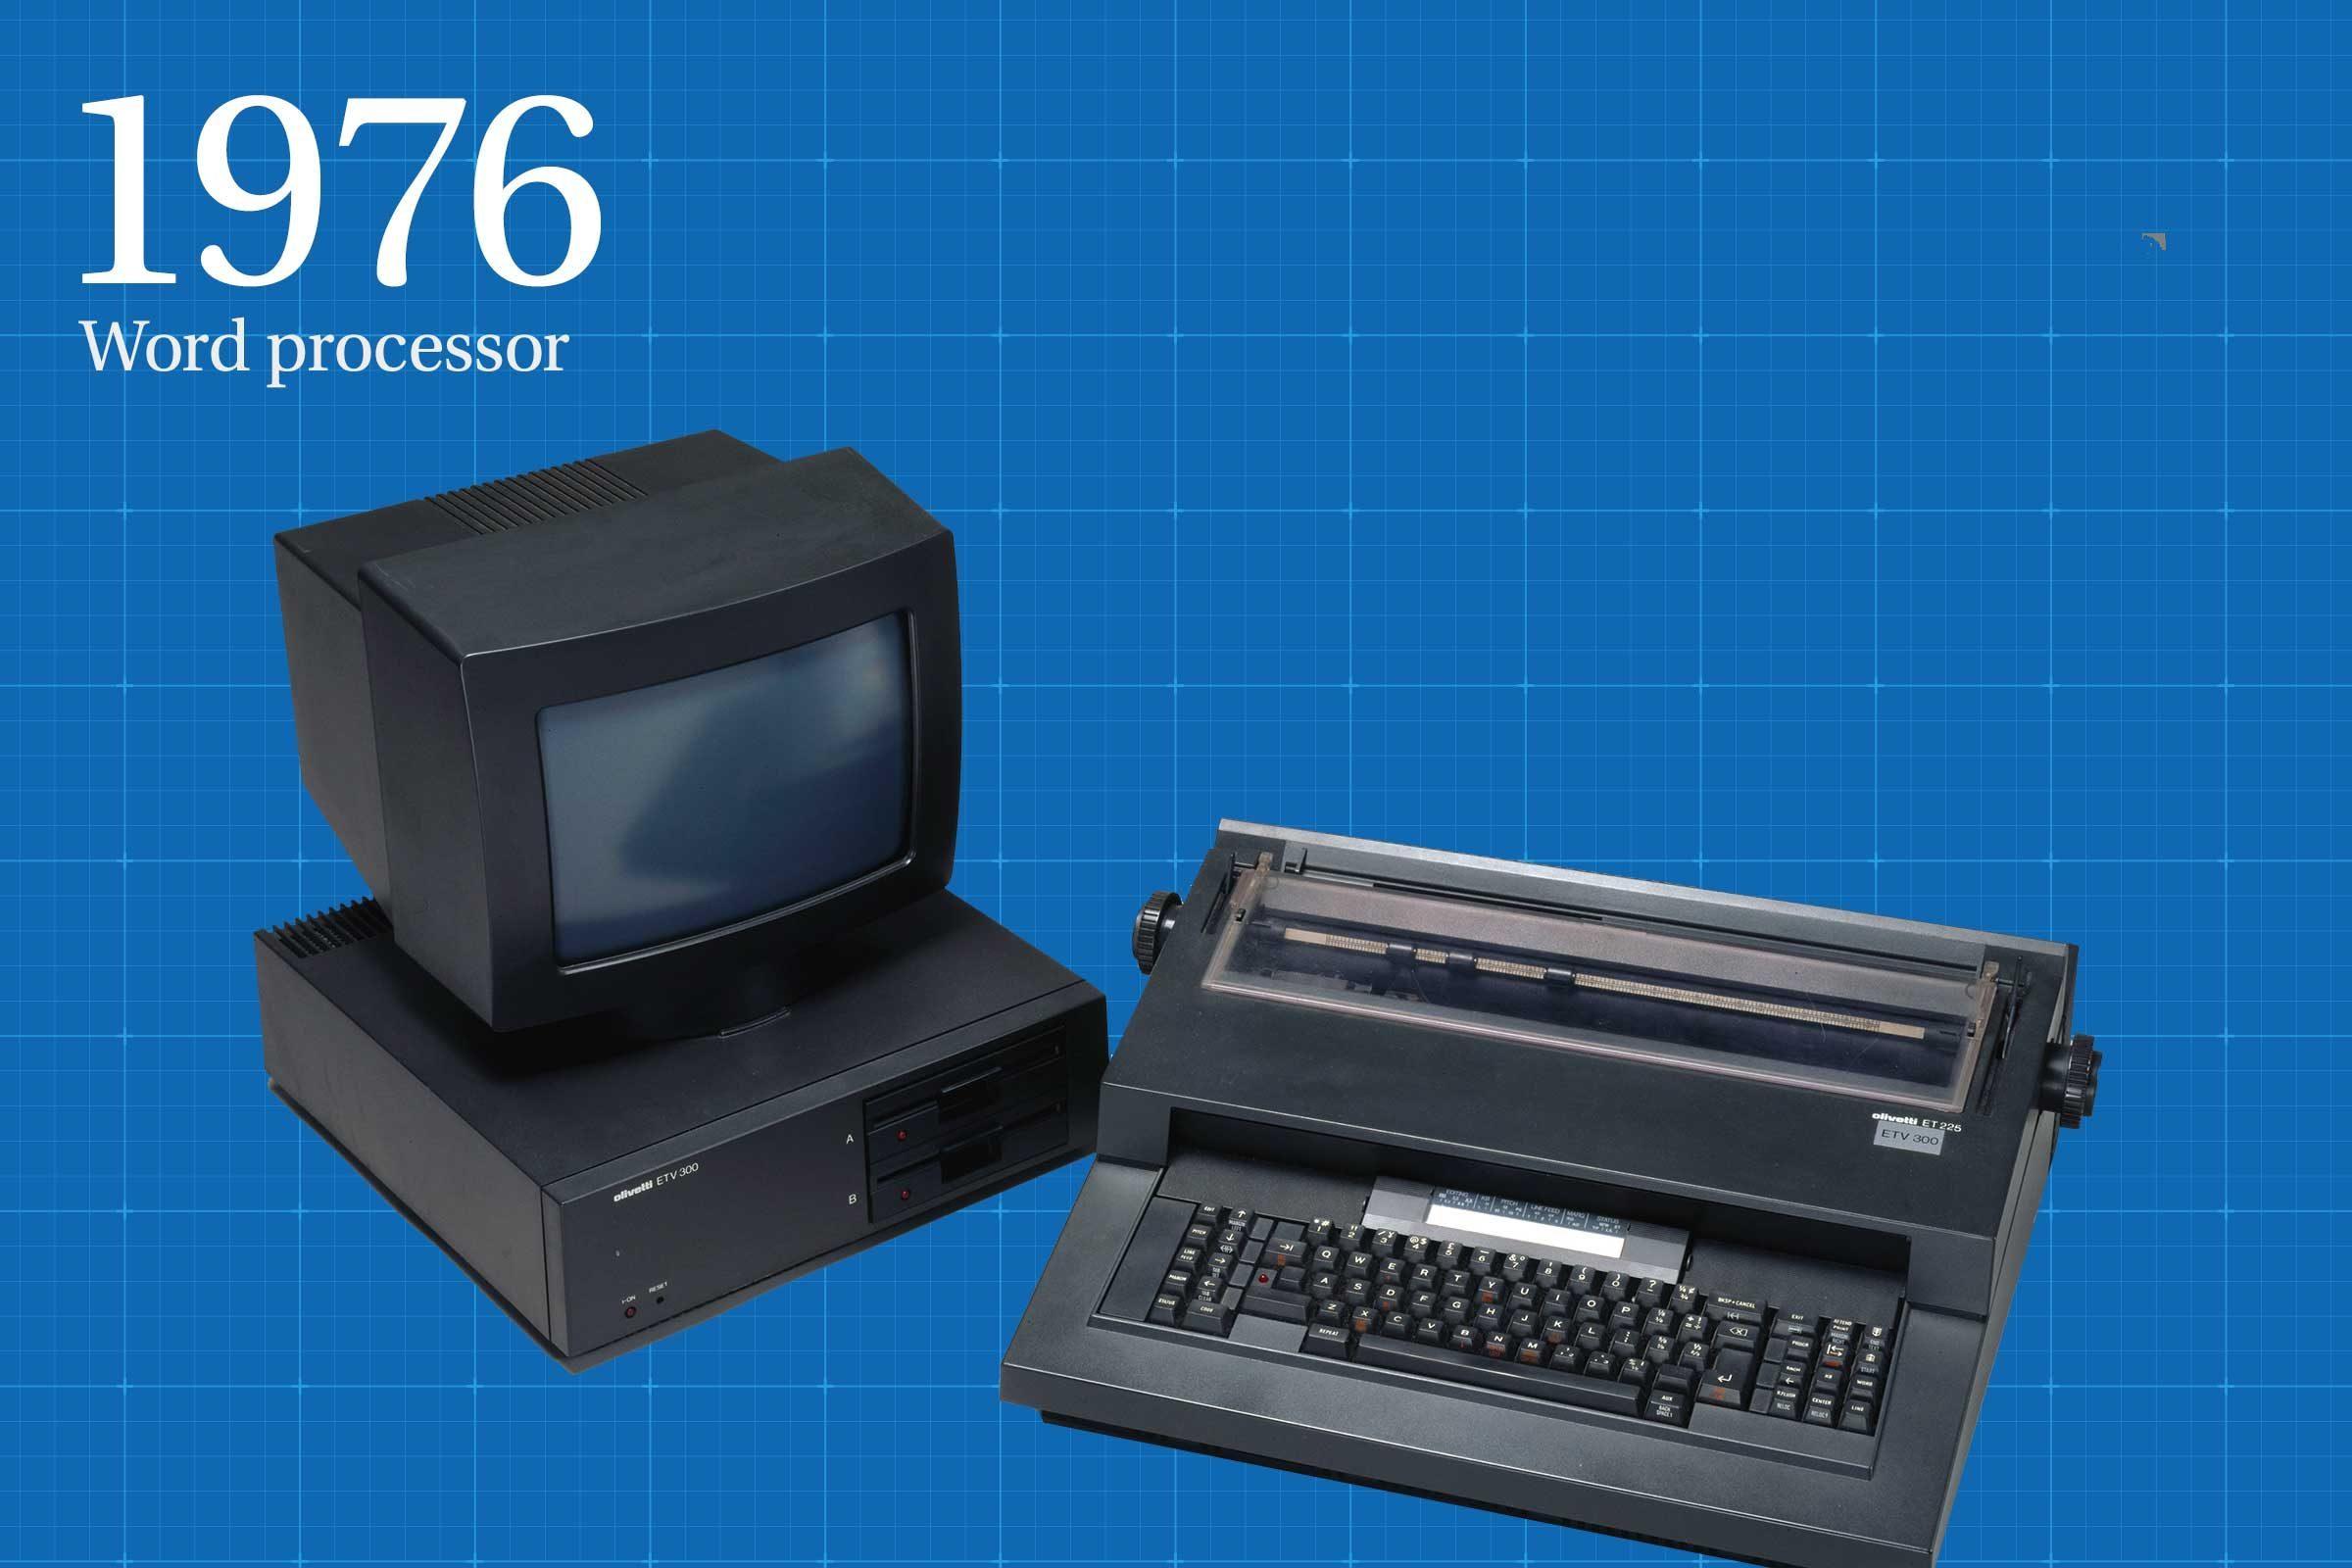 1976: Word processor